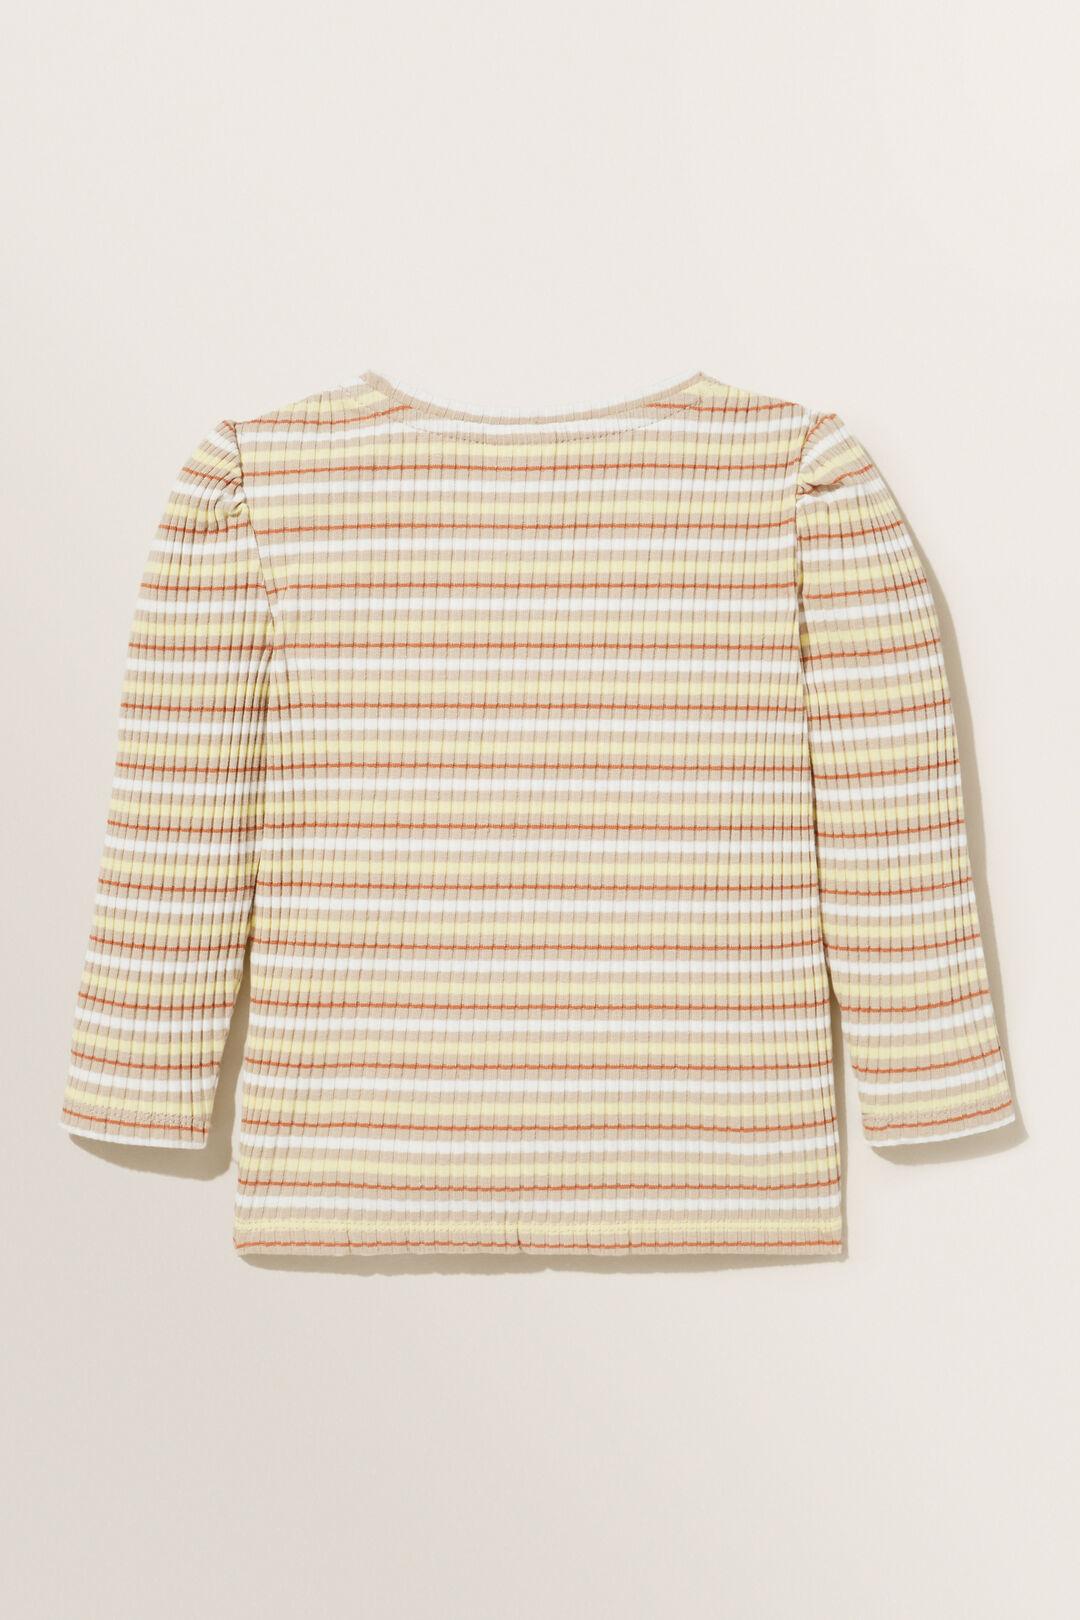 Striped Rib Long Sleeve Tee  MULTI  hi-res